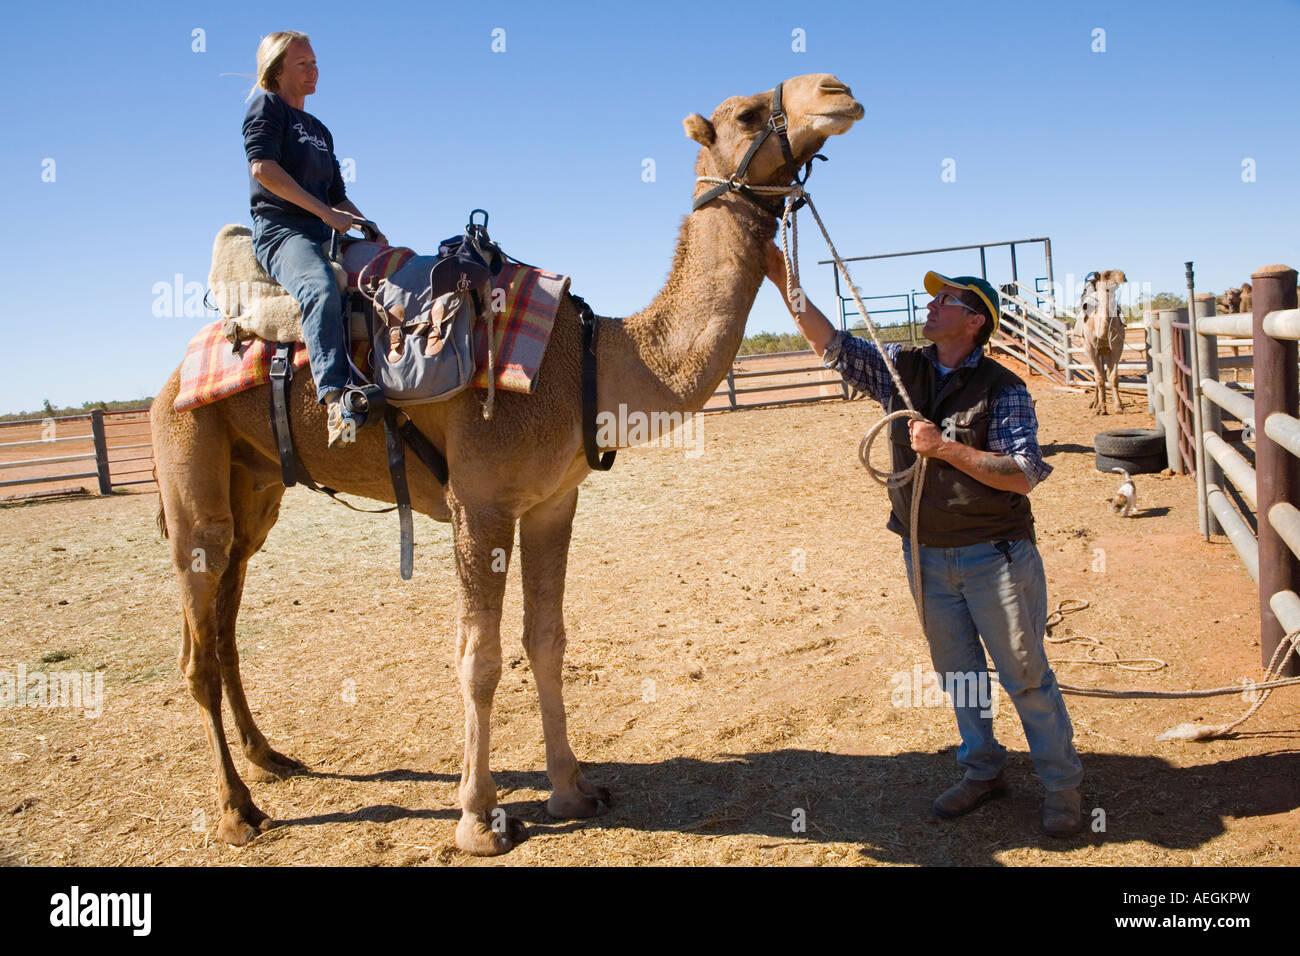 GLENDA CAMEL/CAMEL